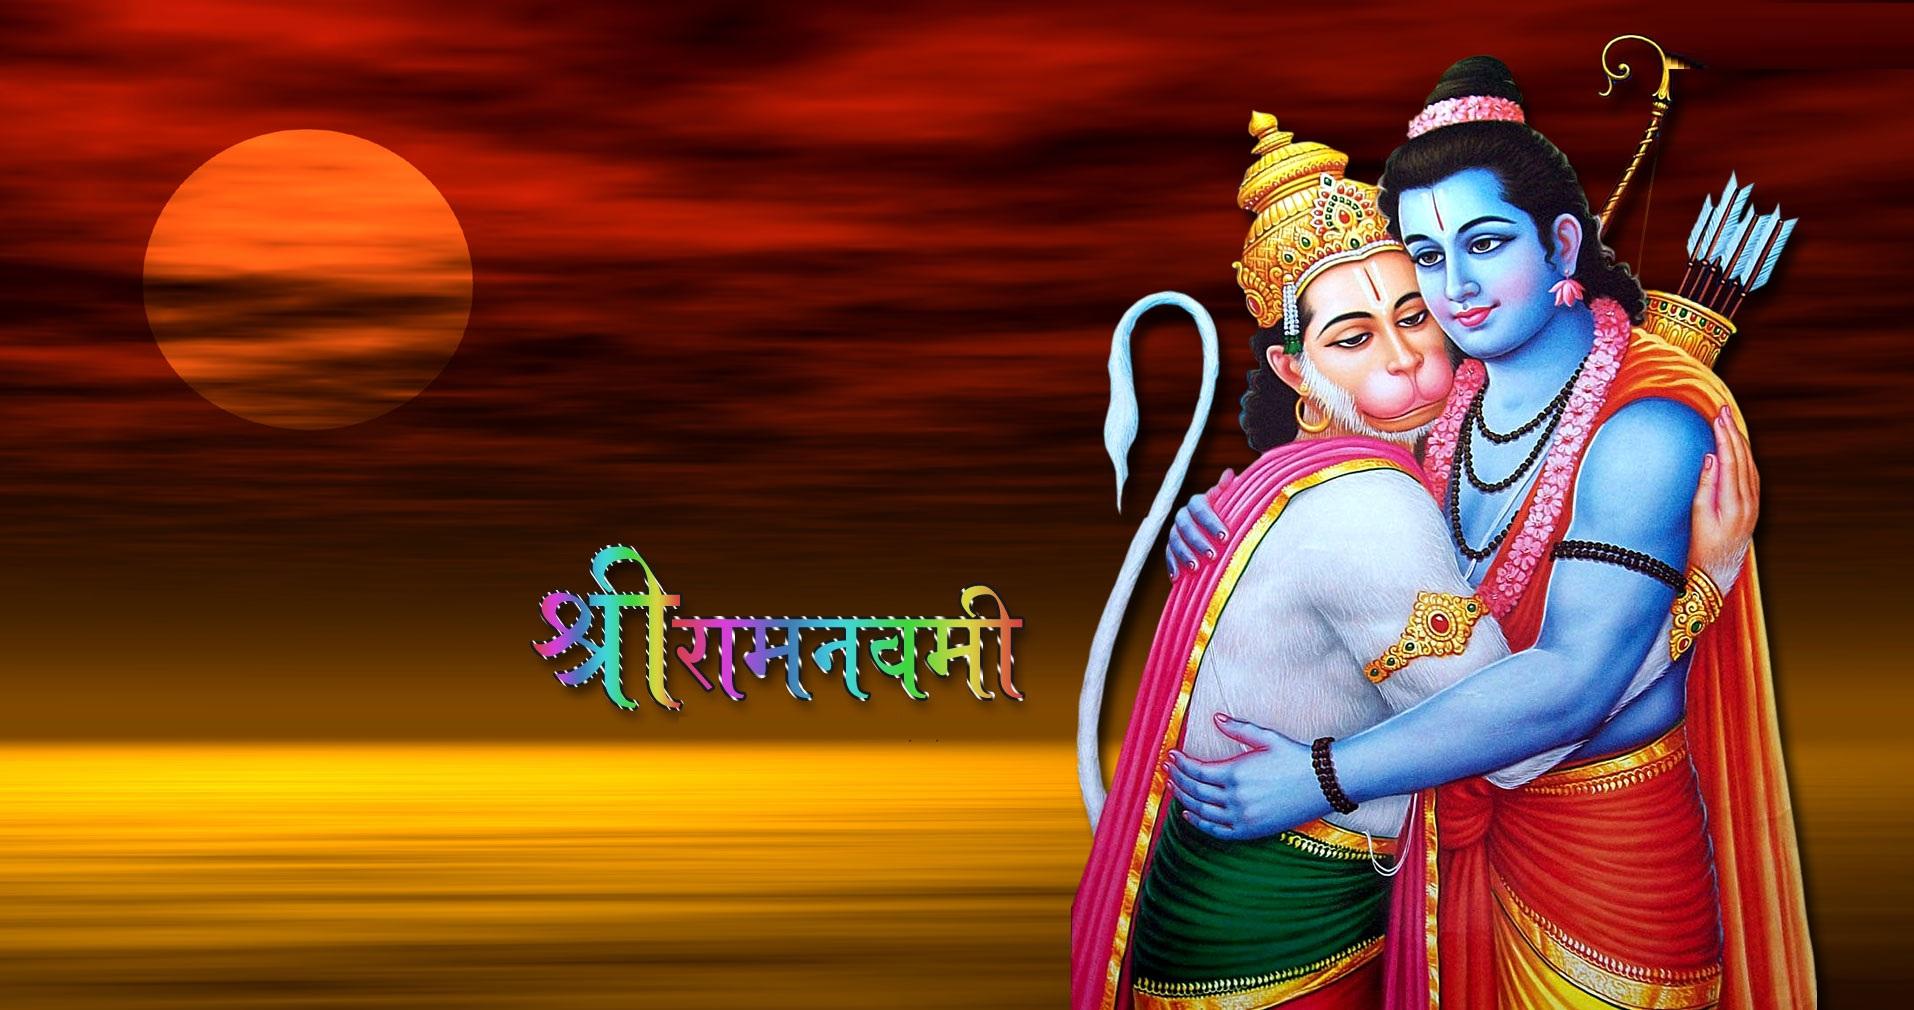 20 Ram Navami Images For Whatsapp Dp Profile Wallpapers Free